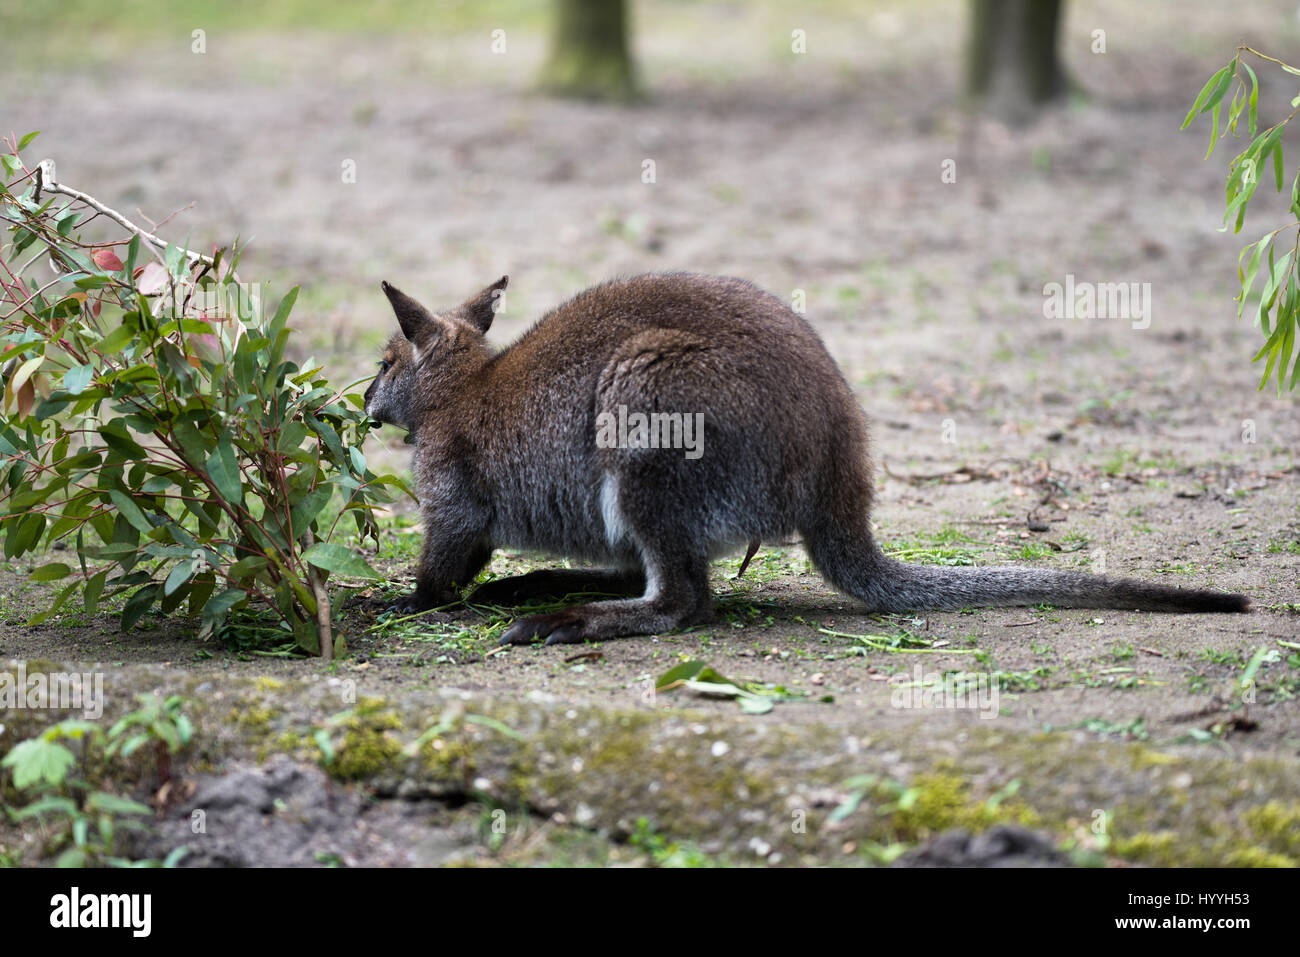 Australian tree kangaroo mangiare erba Immagini Stock